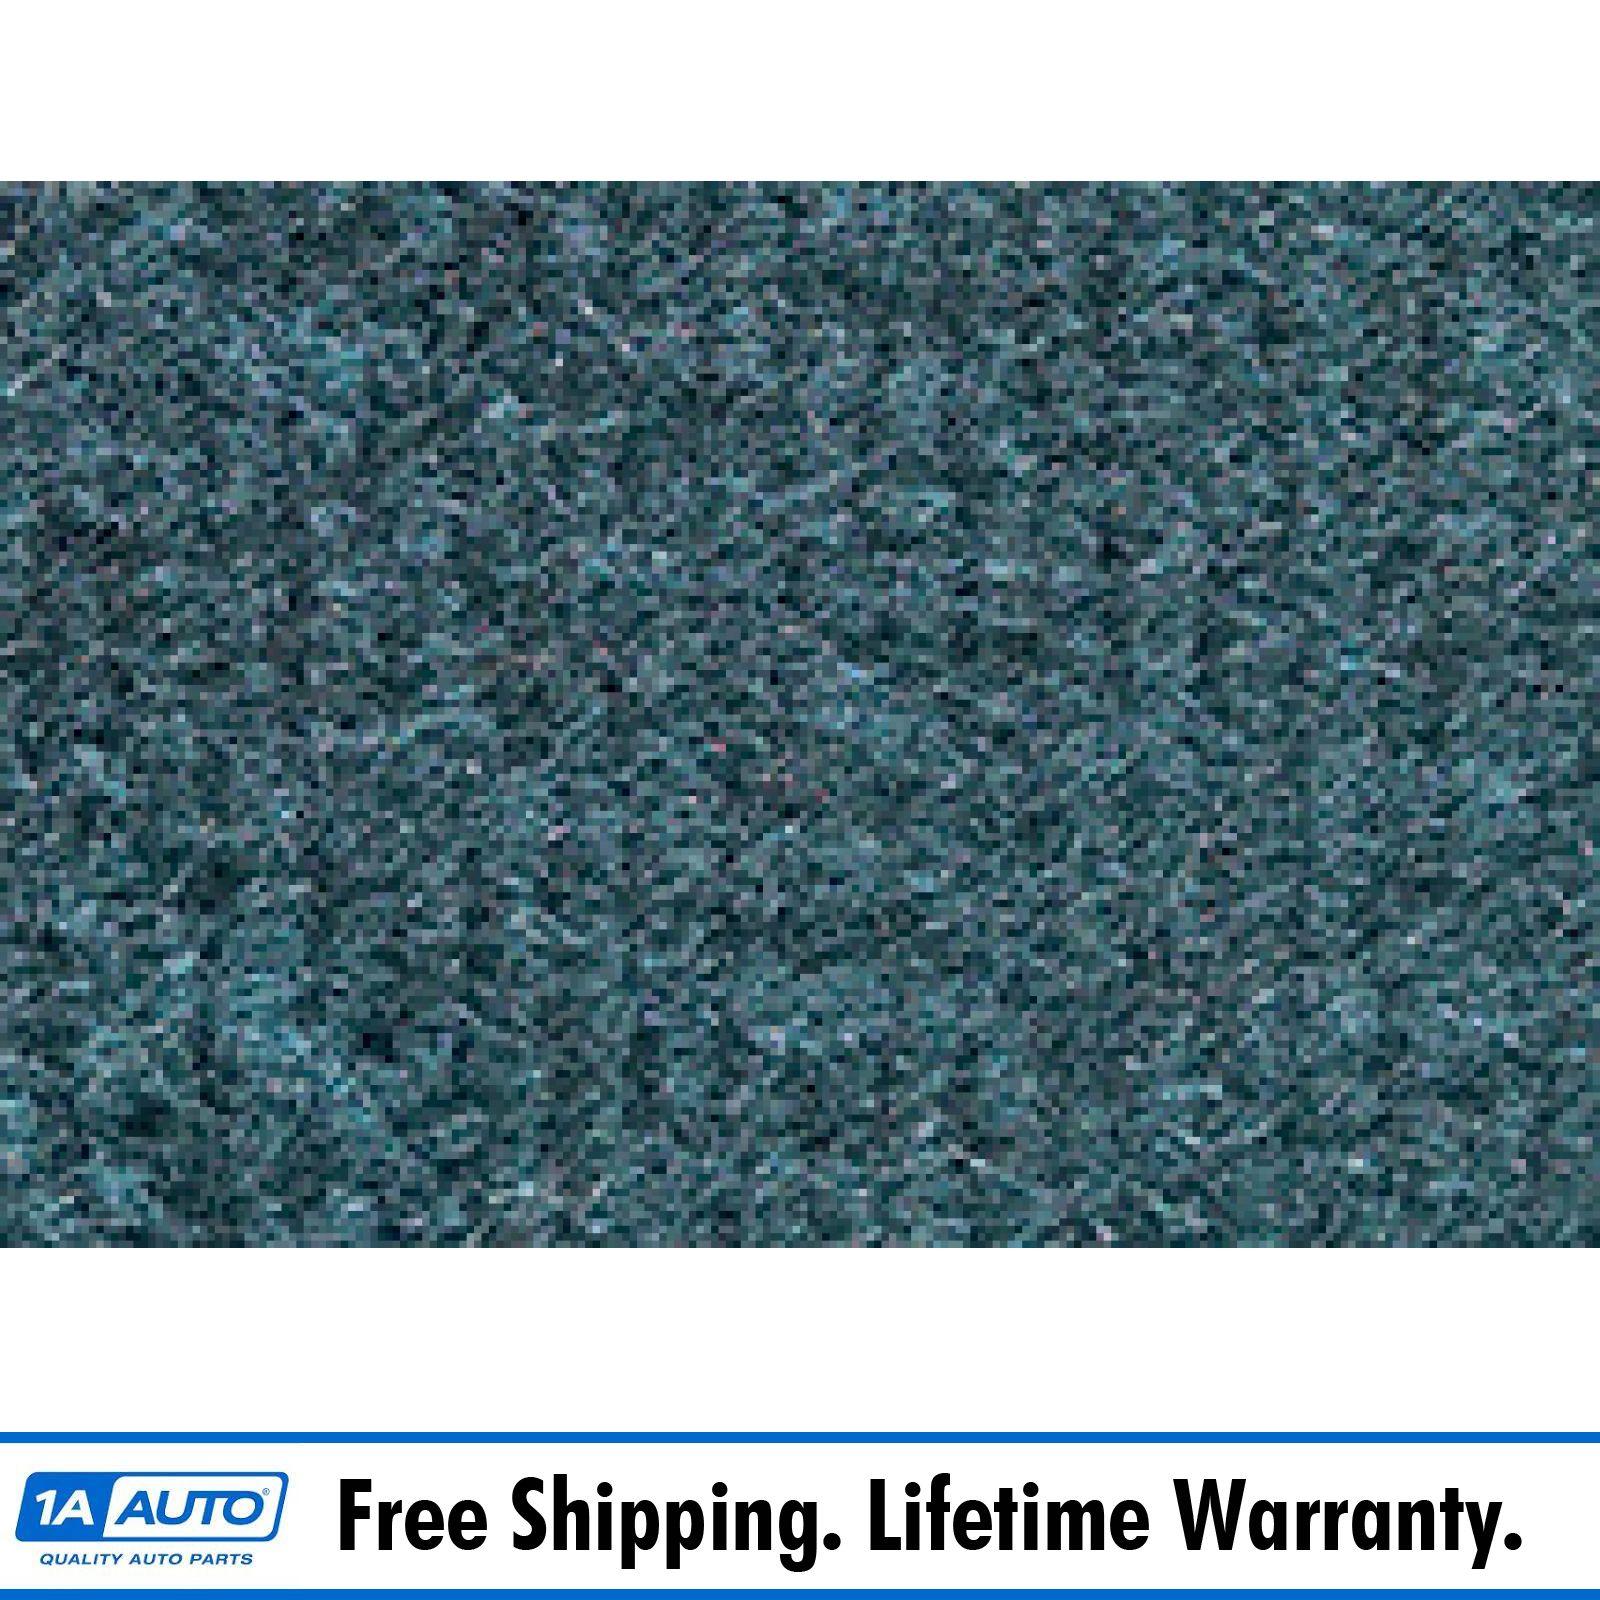 for 1999-06 GMC Sierra 1500 Extended Cab Cutpile 7701-Graphite Complete Carpet